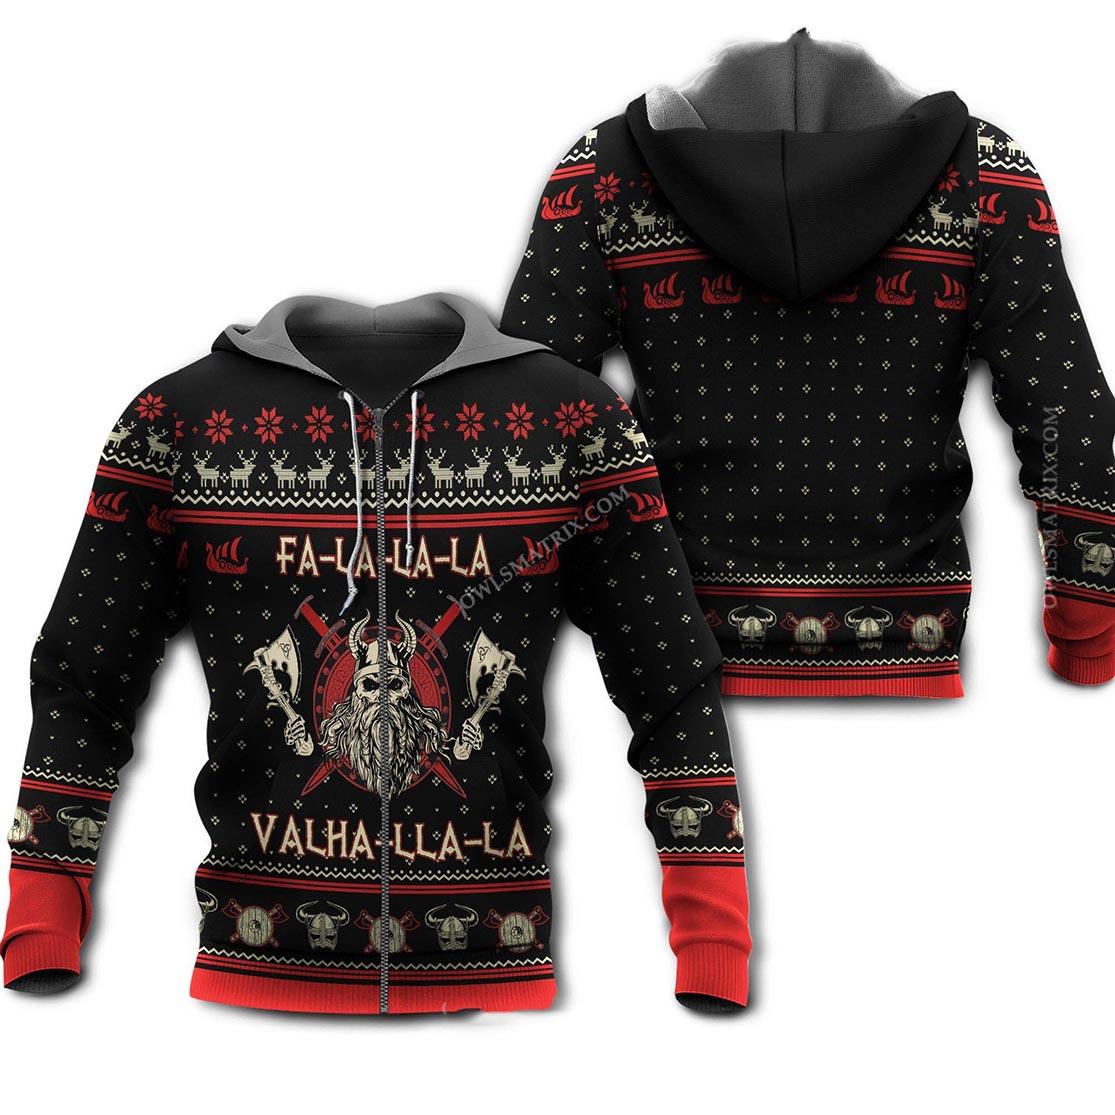 Viking valhalla black and red 3d zip hoodie